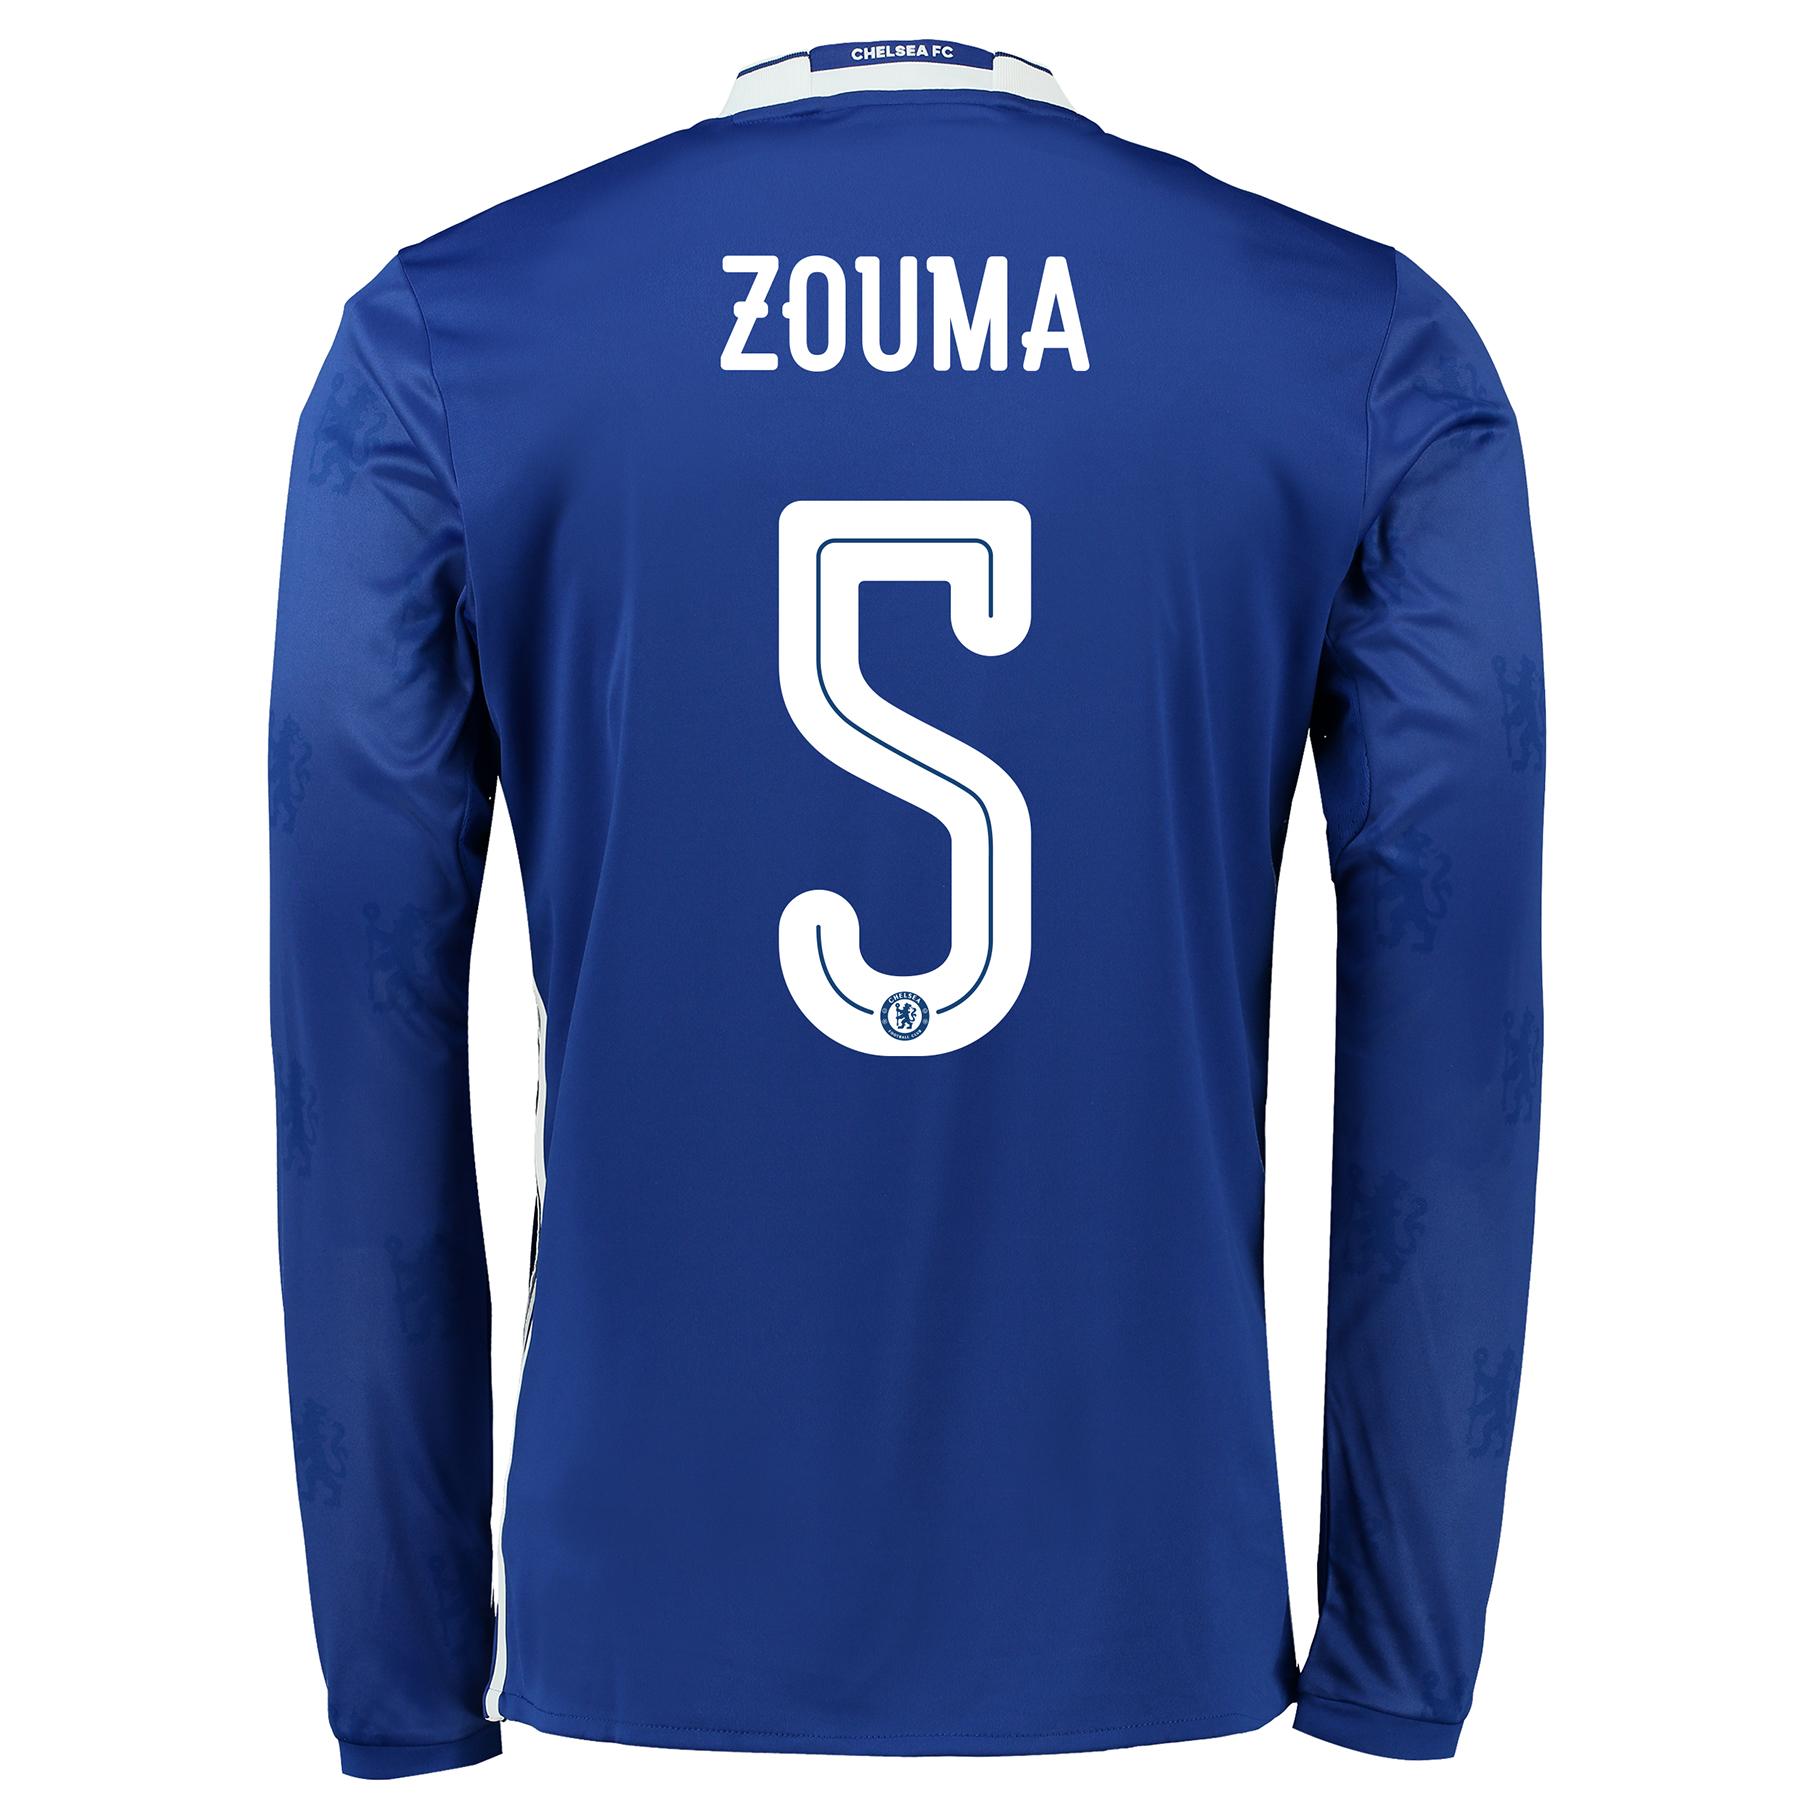 Chelsea Linear Home Shirt 2016-17 - Kids - Long Sleeve with ZOUMA 5 pr